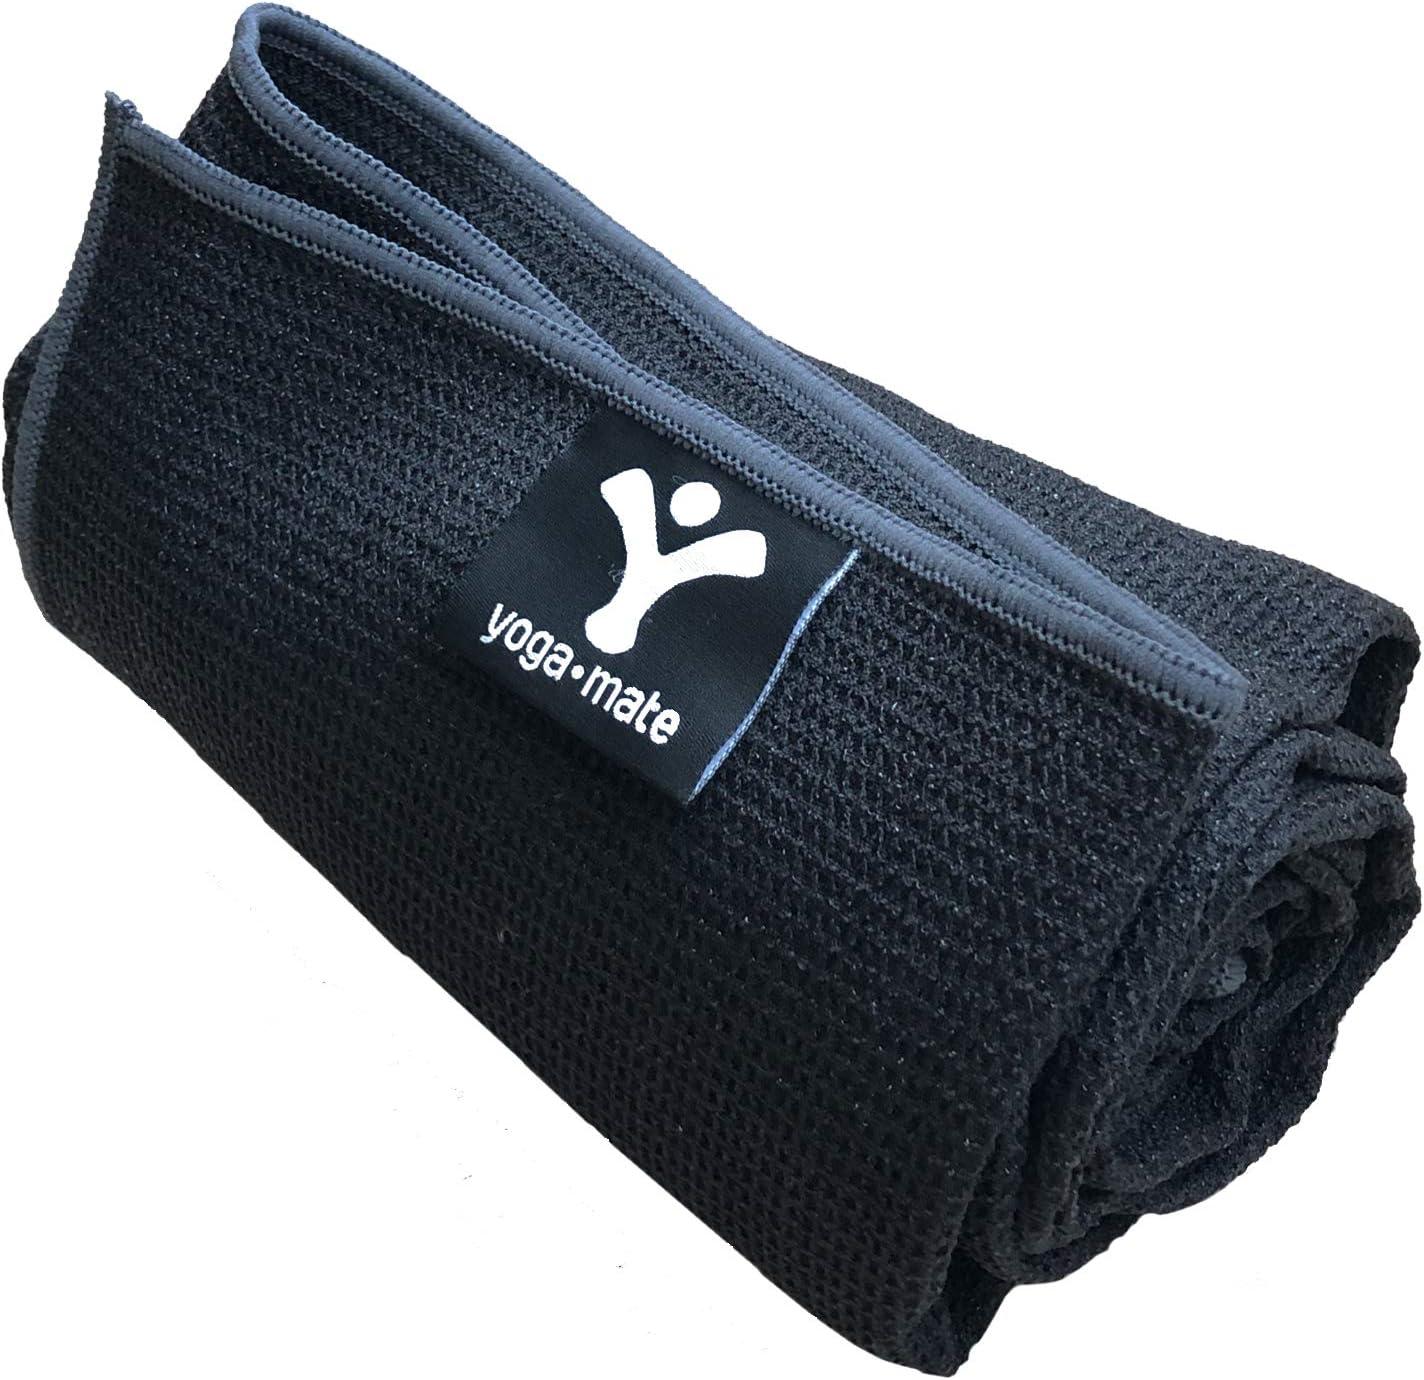 Amazon.com : Sticky Grip Yoga Towel - Best Non-Slip Towel ...